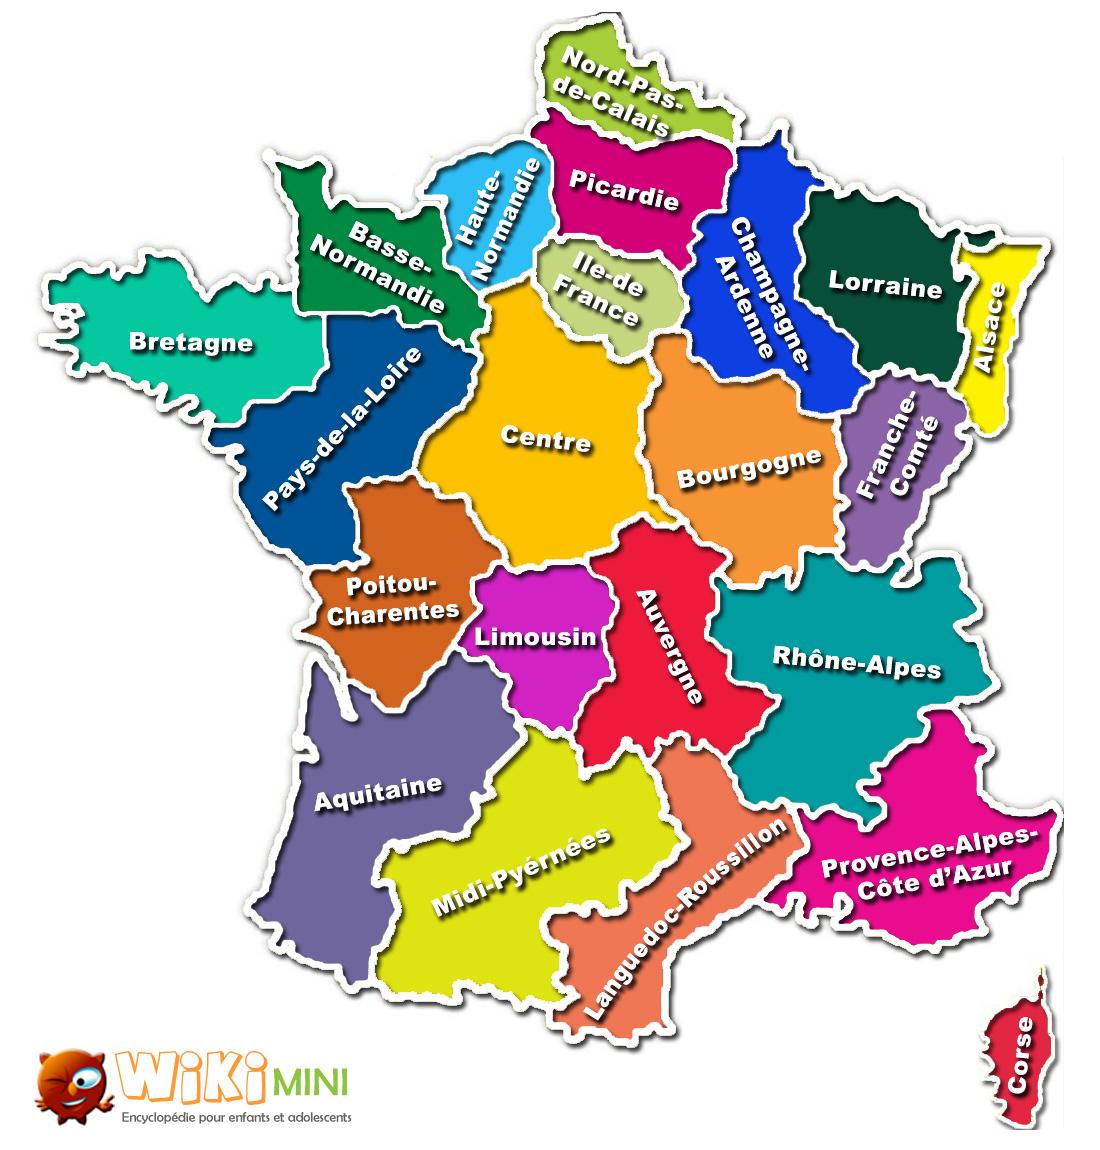 RENCONTRES PAR REGIONS ! Carte-r%C3%A9gions-regions-France